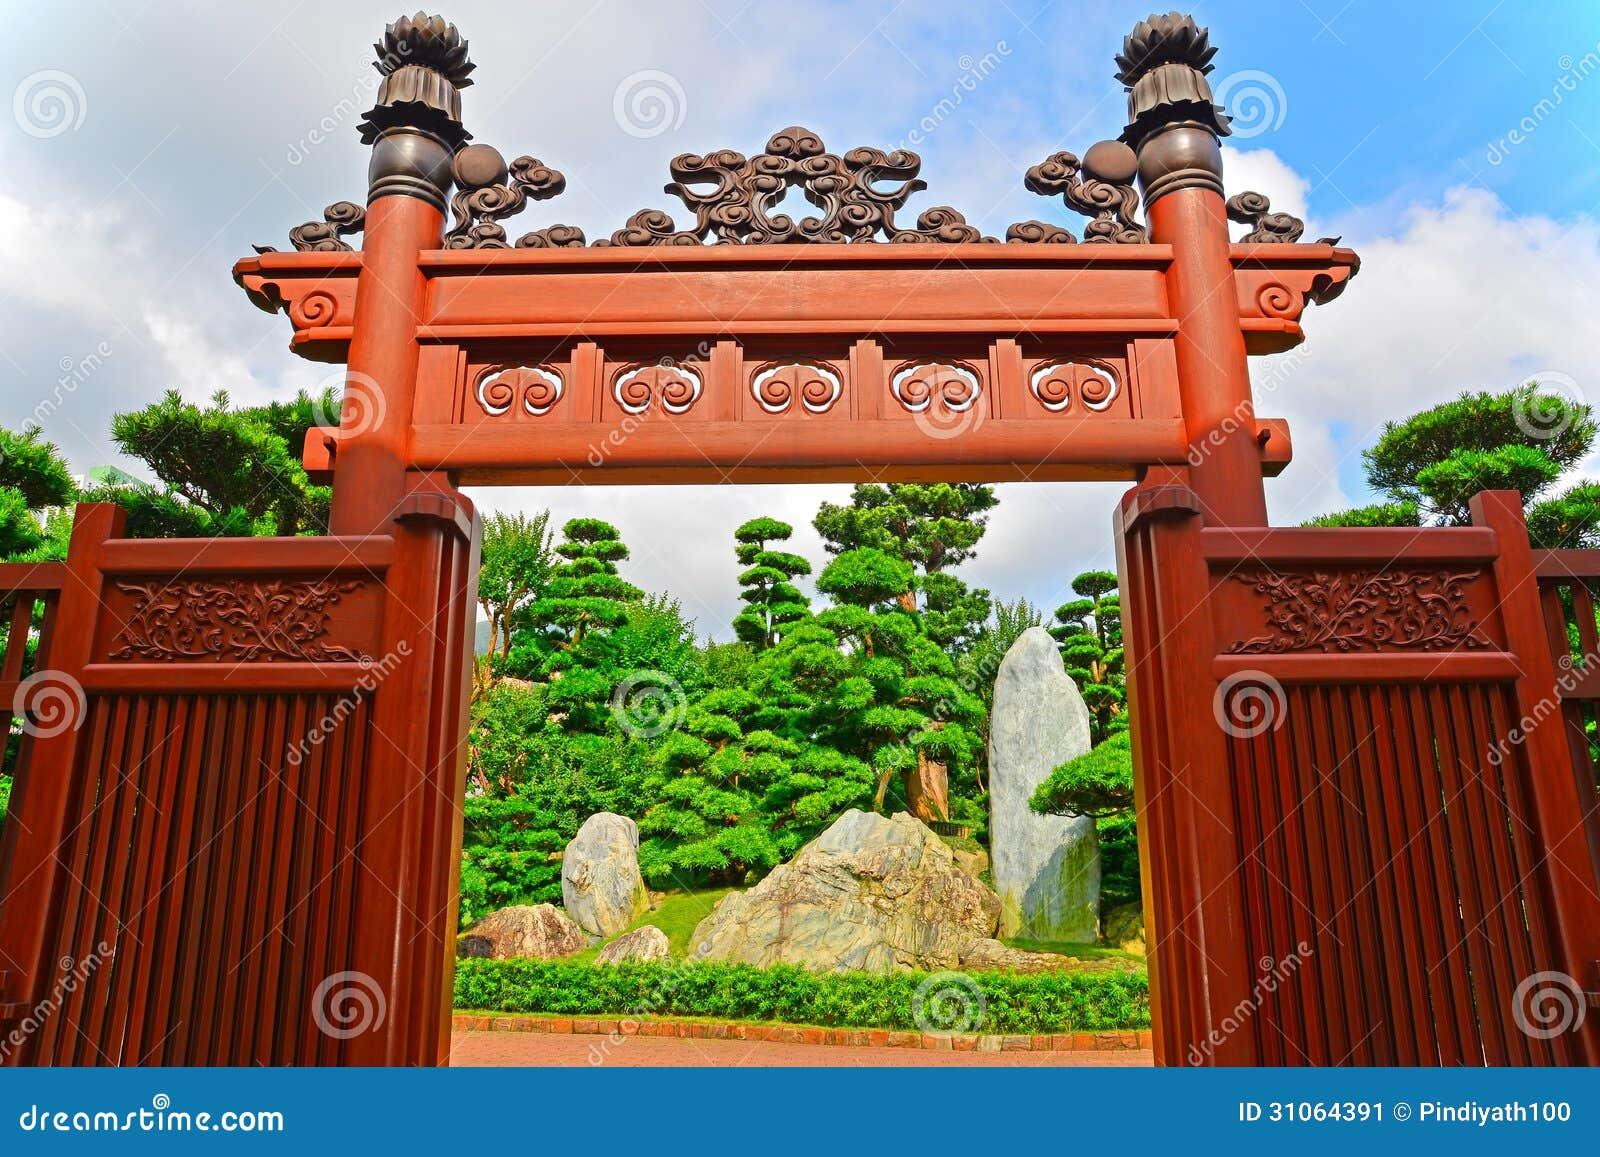 Zen Garden Entrance Stock Image Image Of Tranquil Tourism 31064391